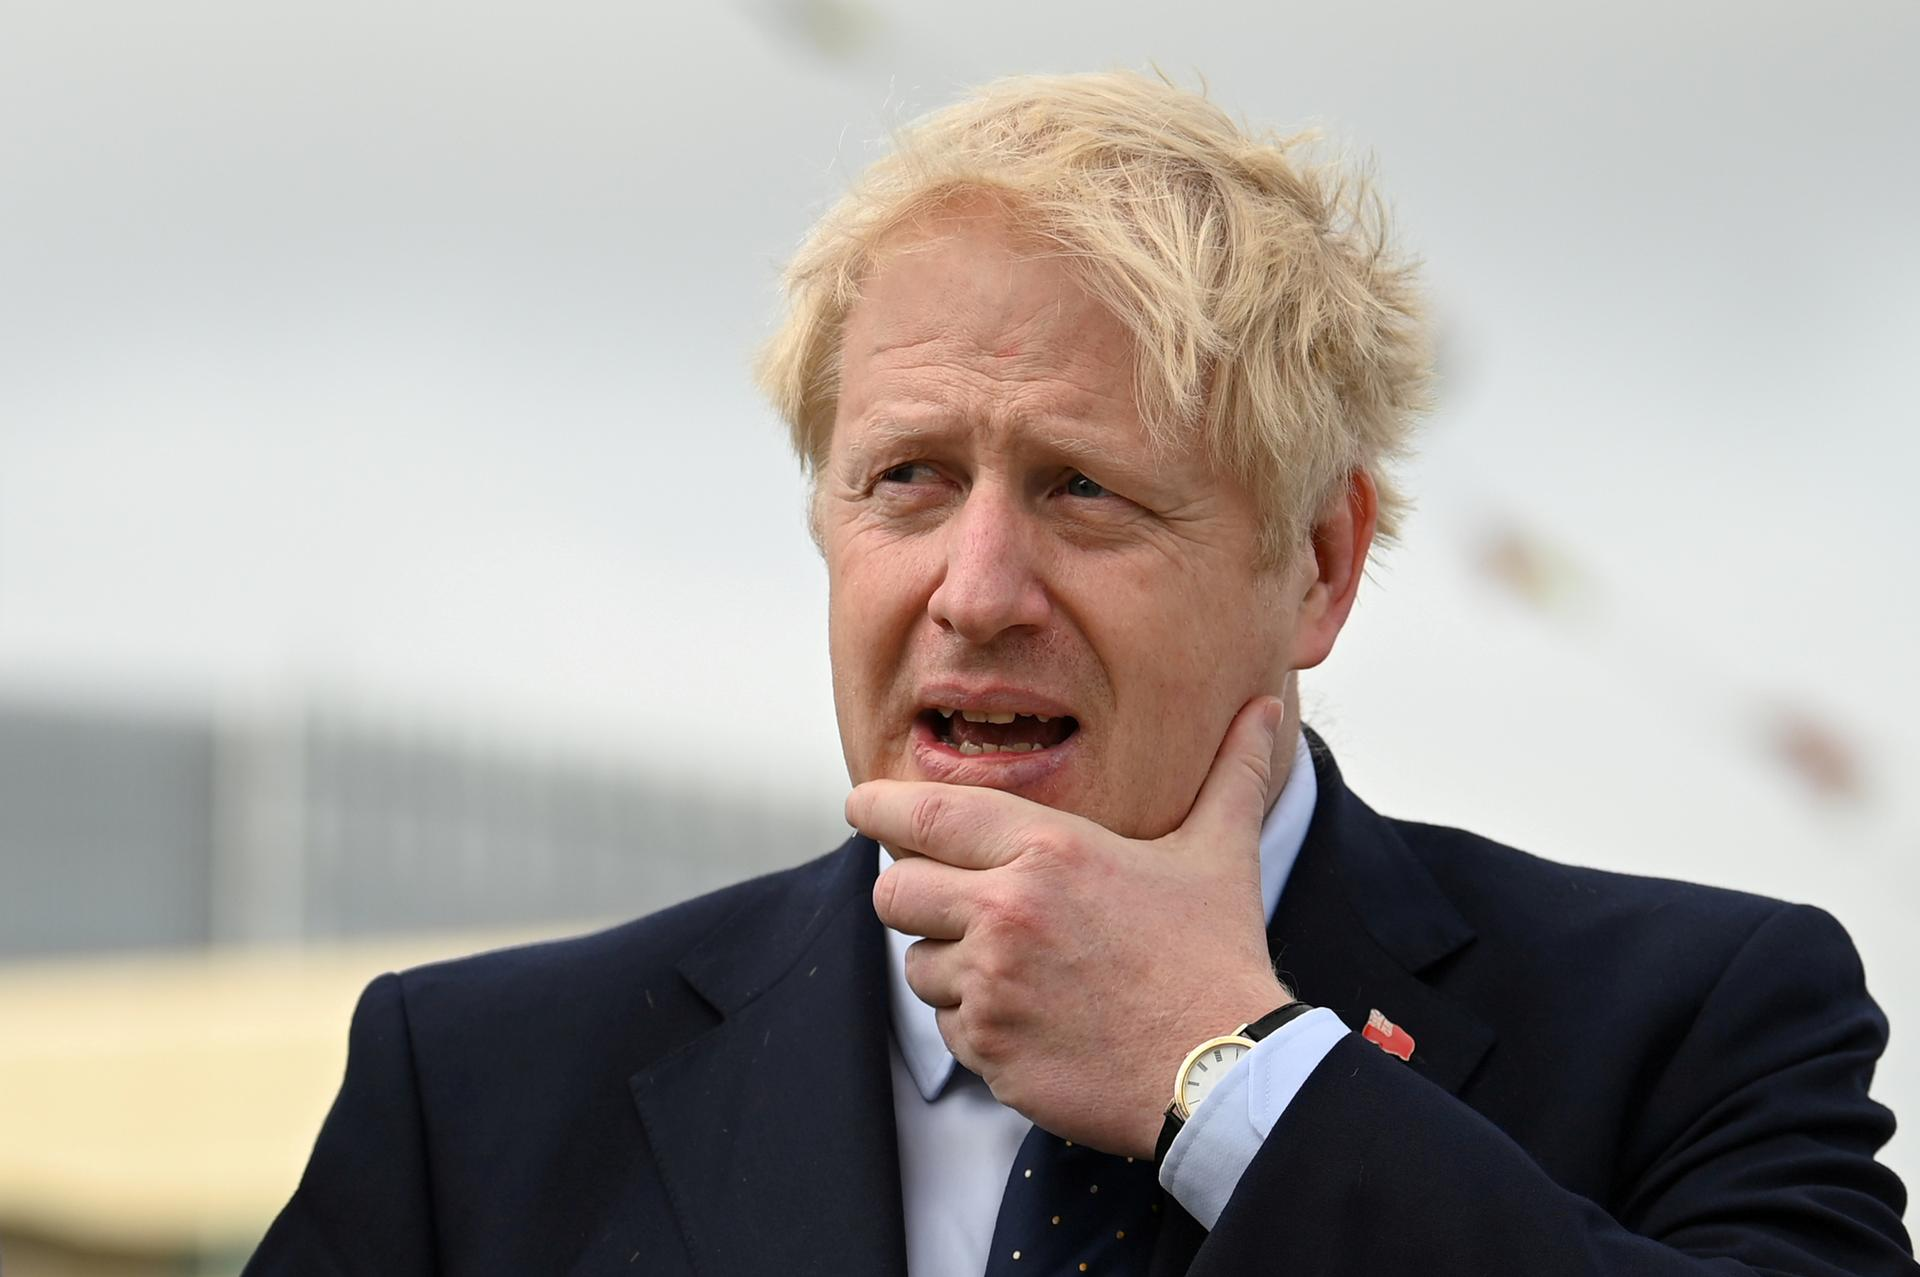 Johnson, likening himself to Incredible Hulk, vows Oct. 31 Brexit